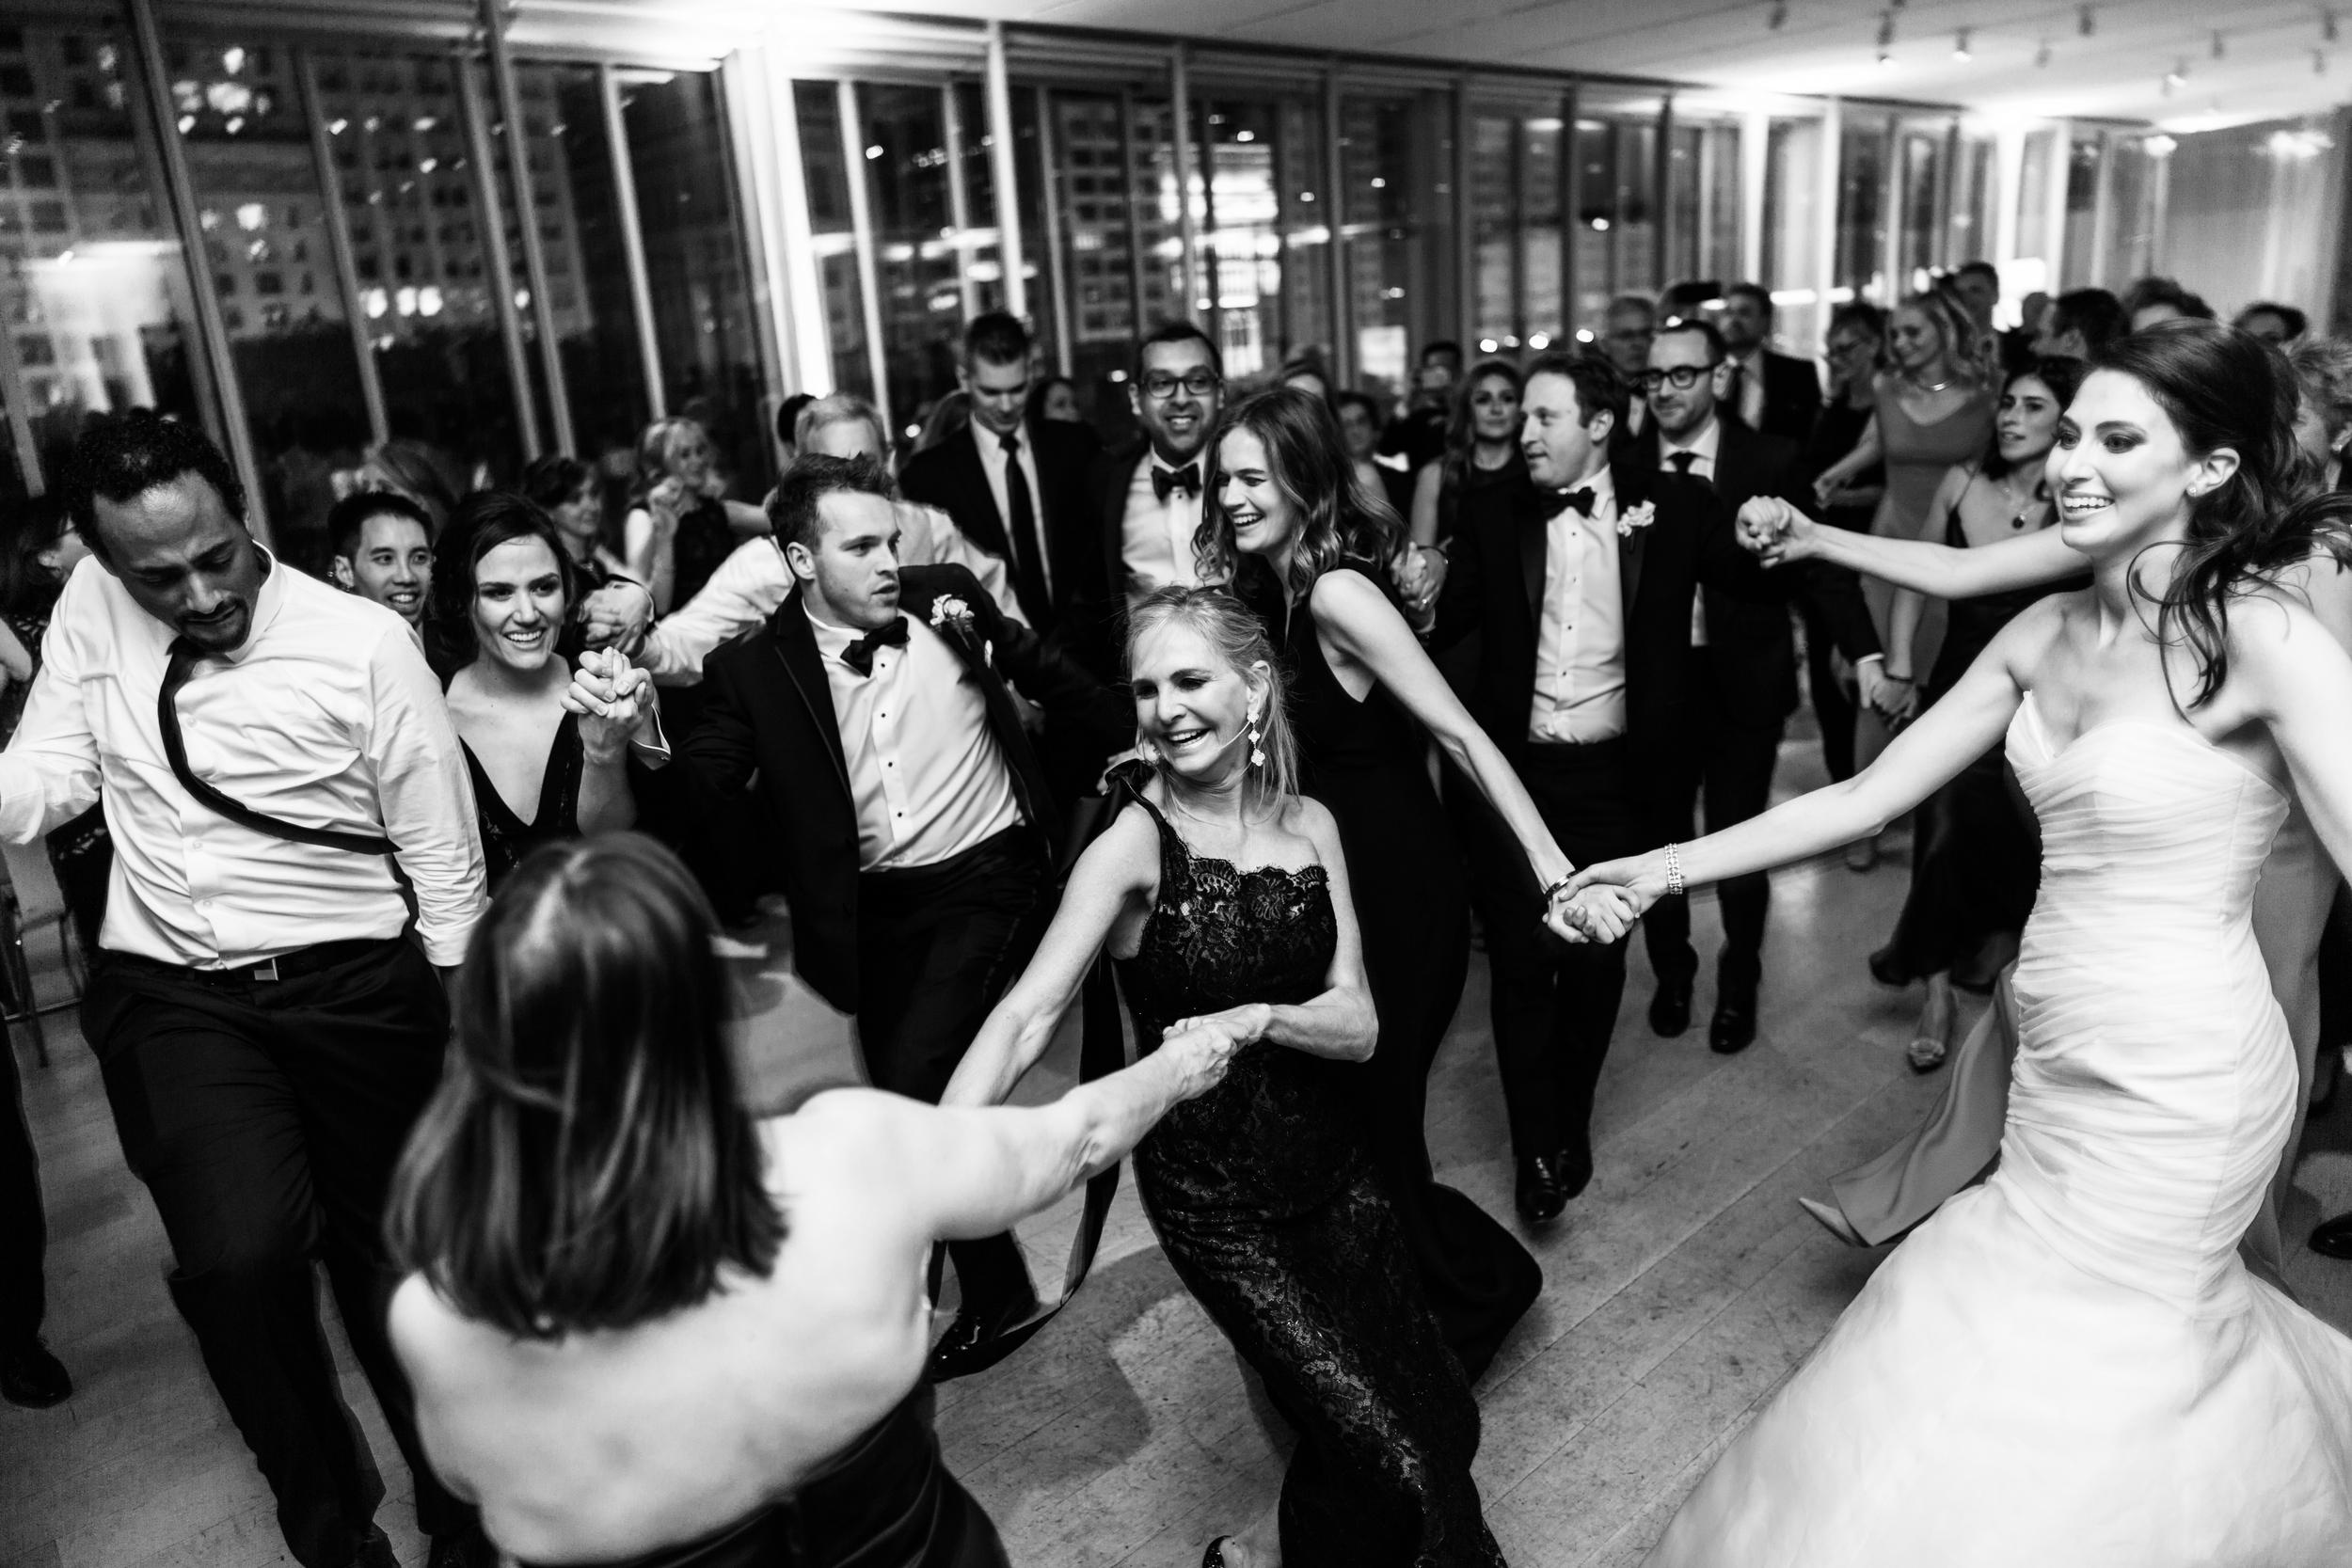 I always get the best dancing photos when BKO is playing!!